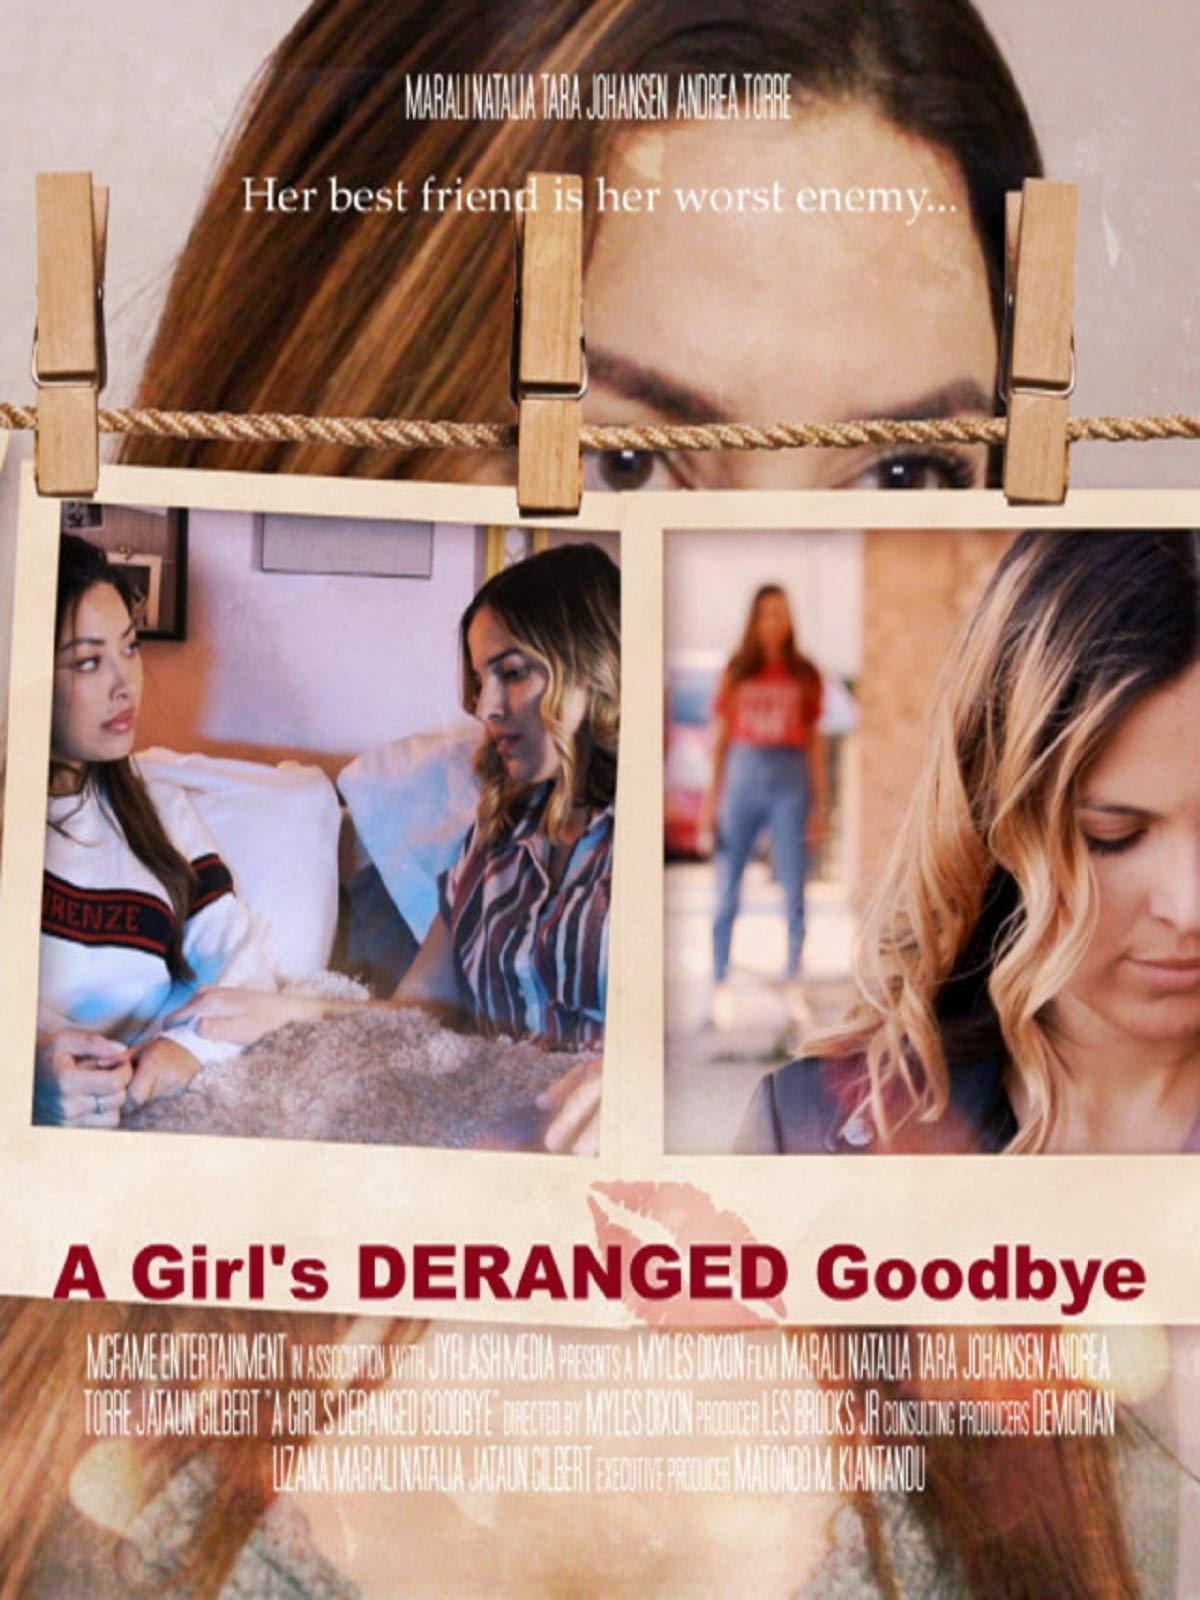 A Girl's Deranged Goodbye